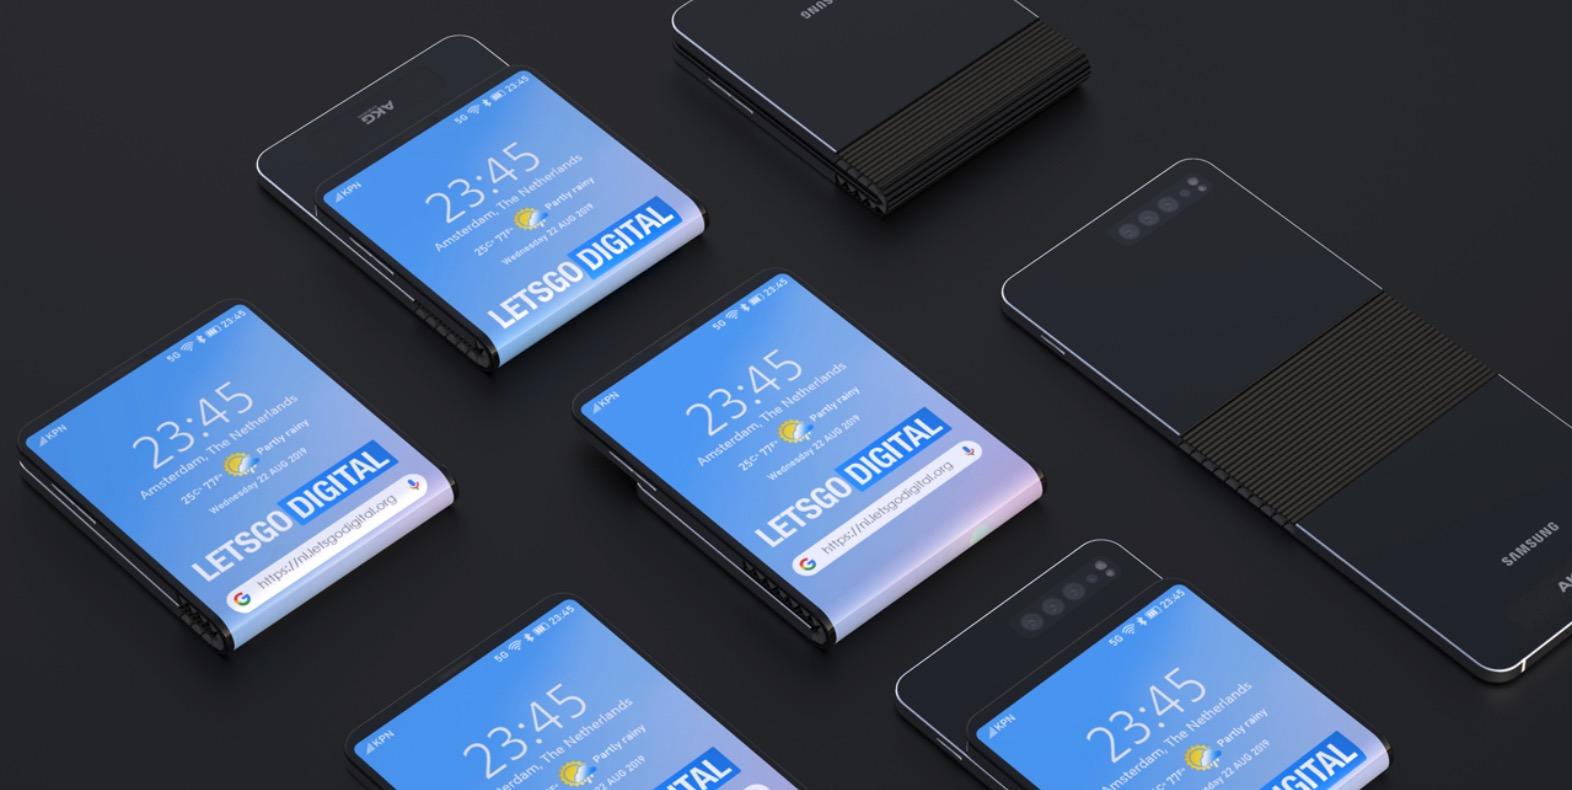 Samsung brettbar patent